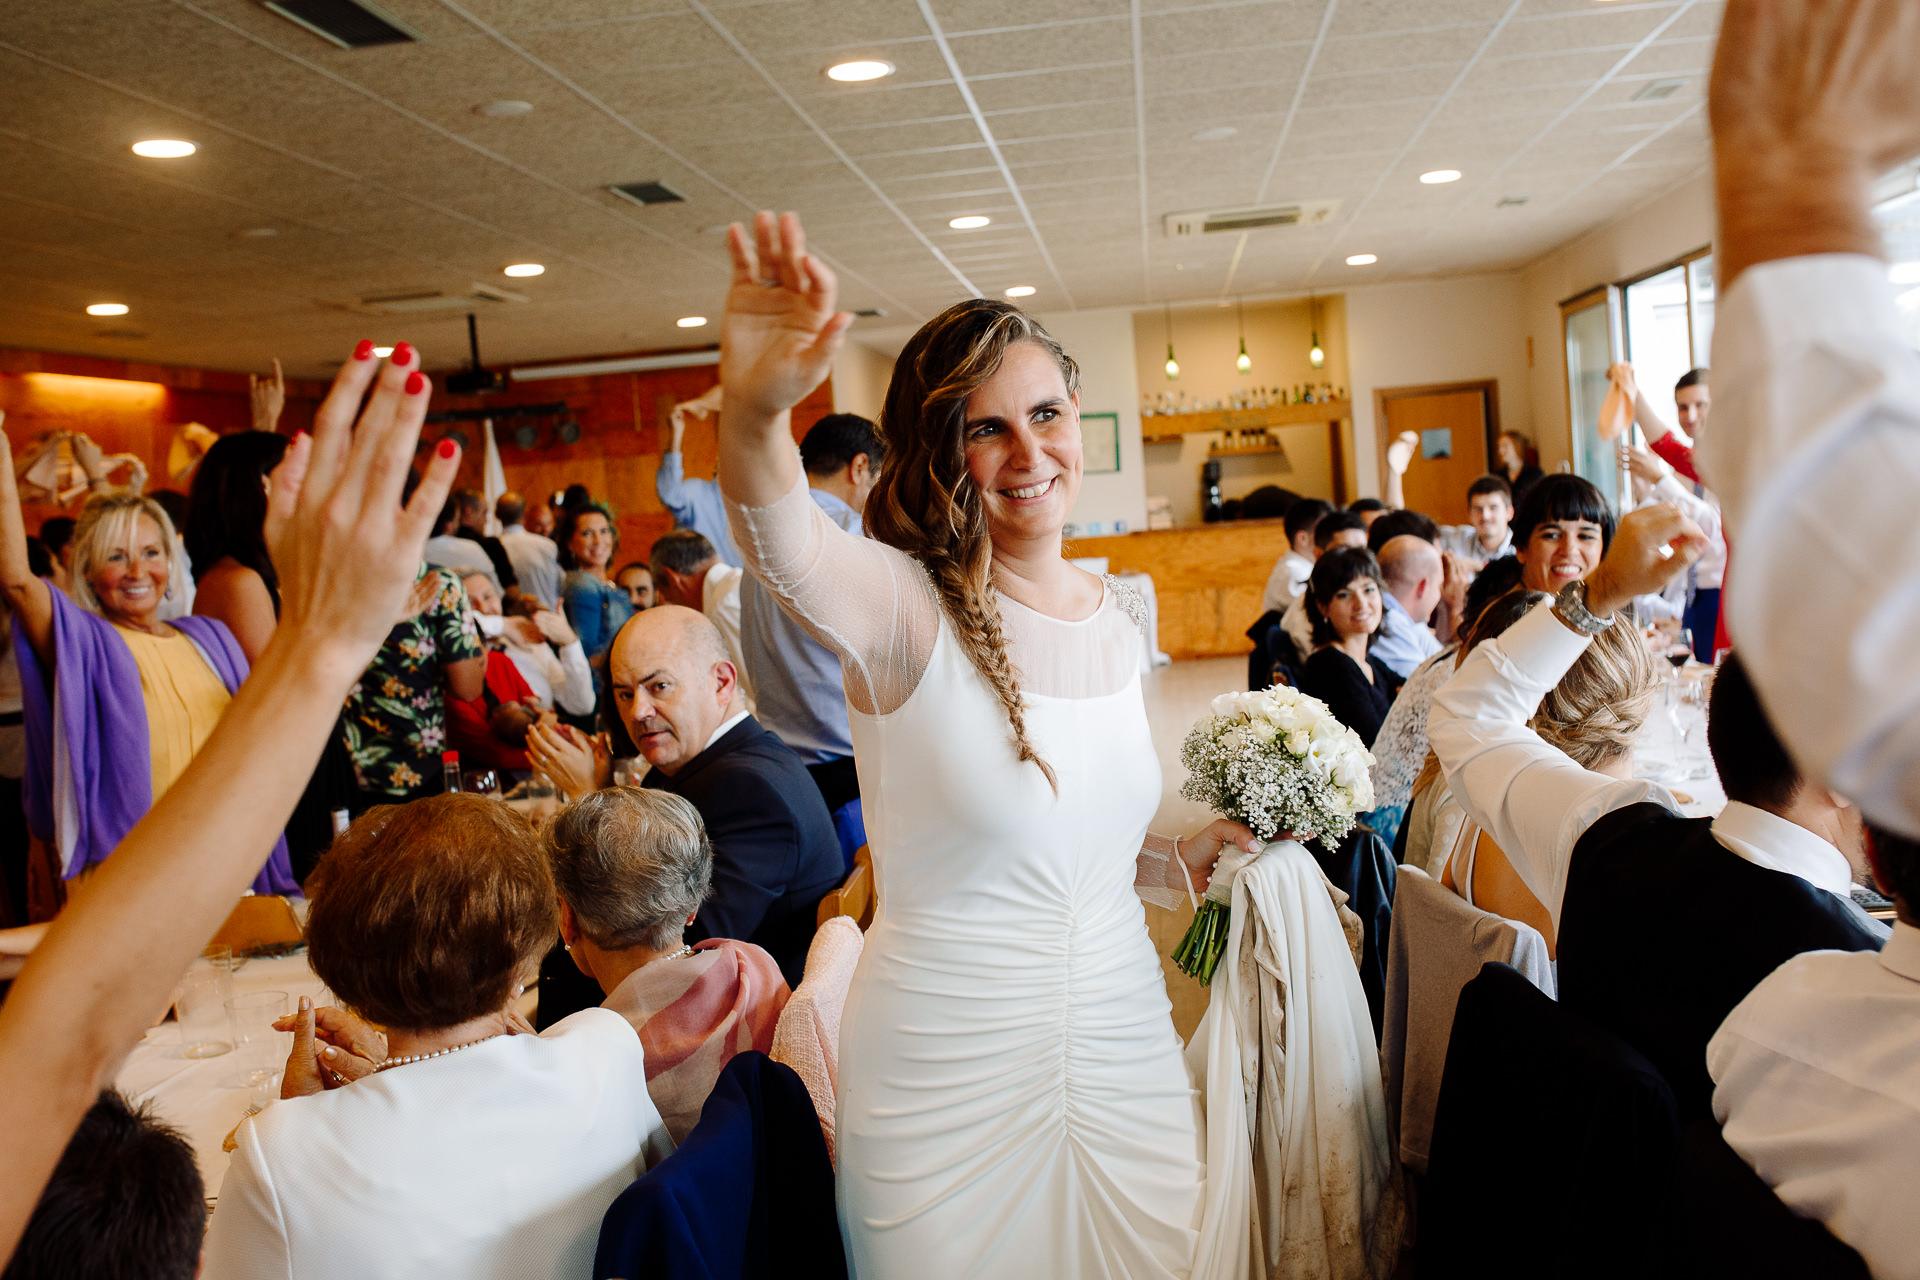 boda civil sagardotegi sidrería arizia zarautz 153210